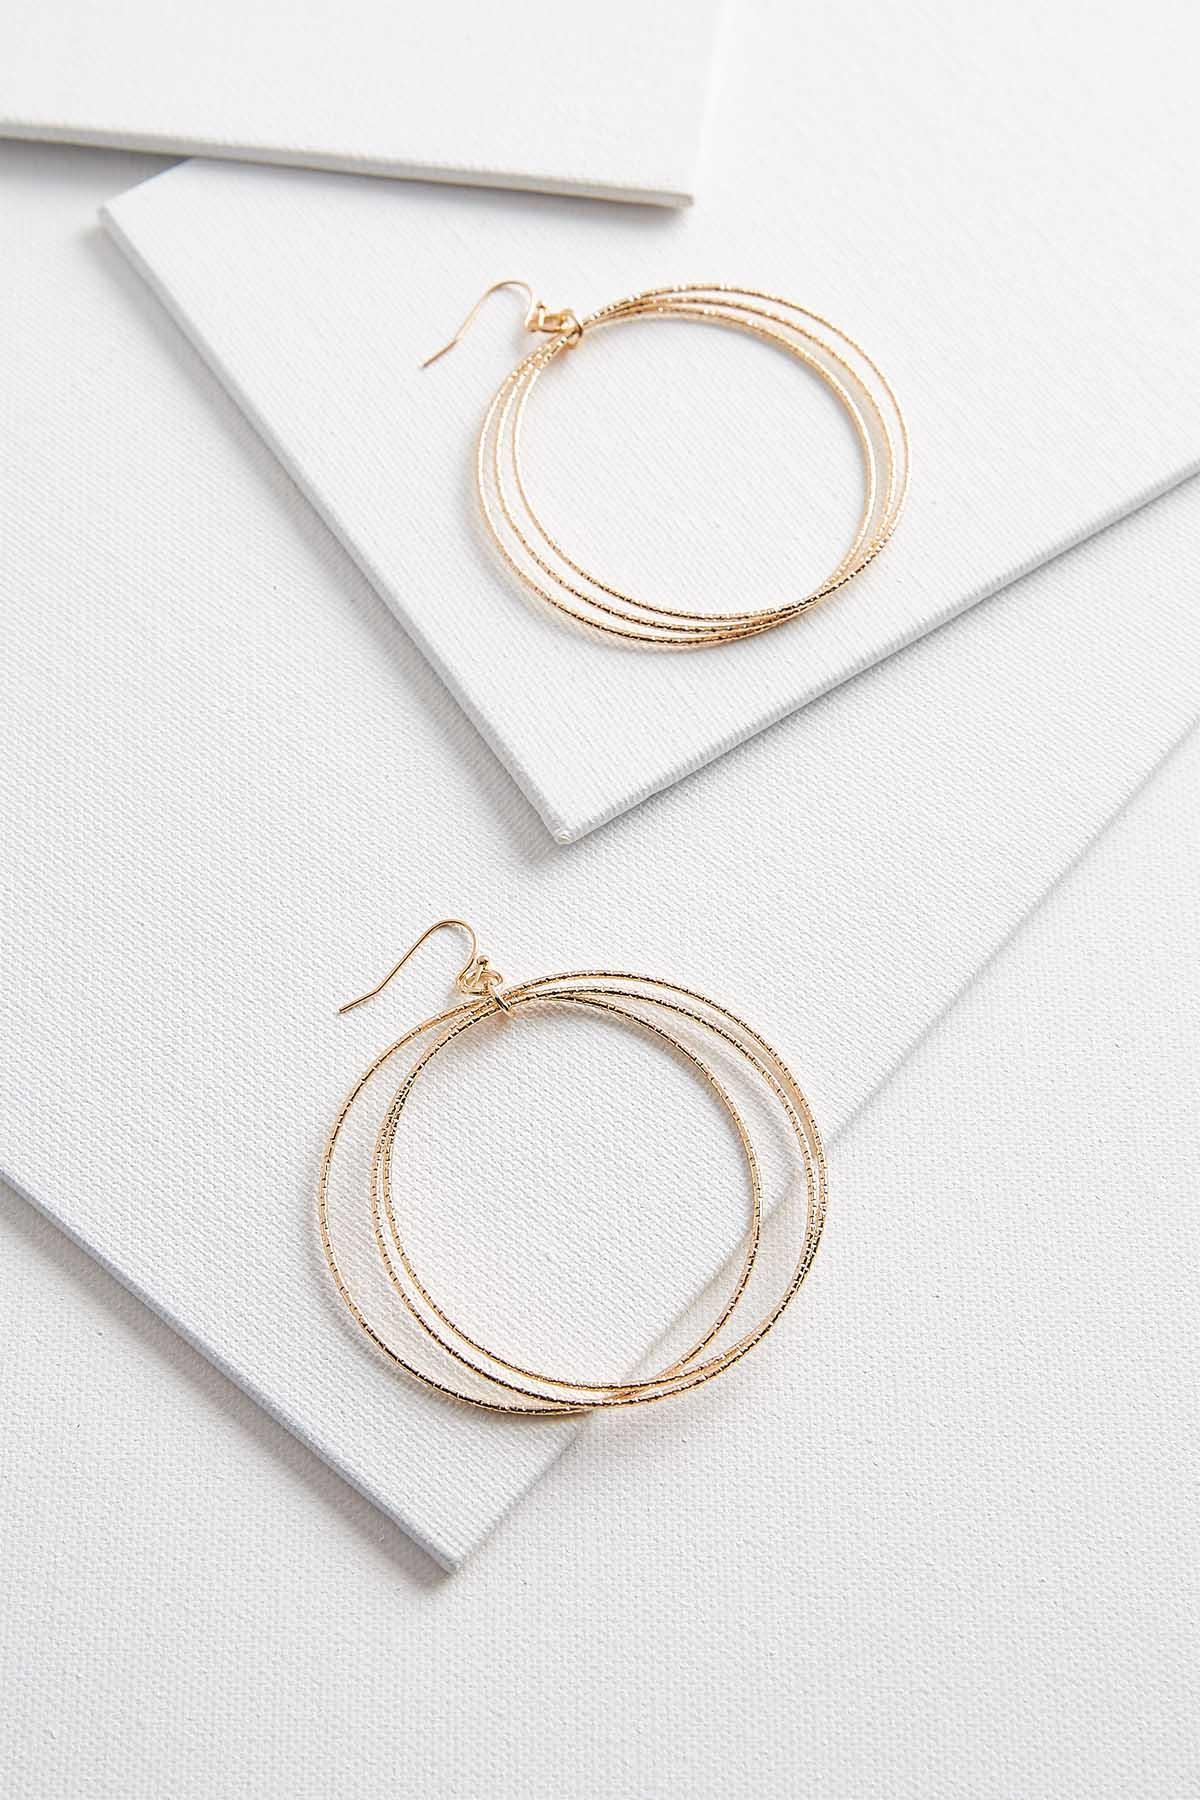 Dangling Textured Ring Earrings